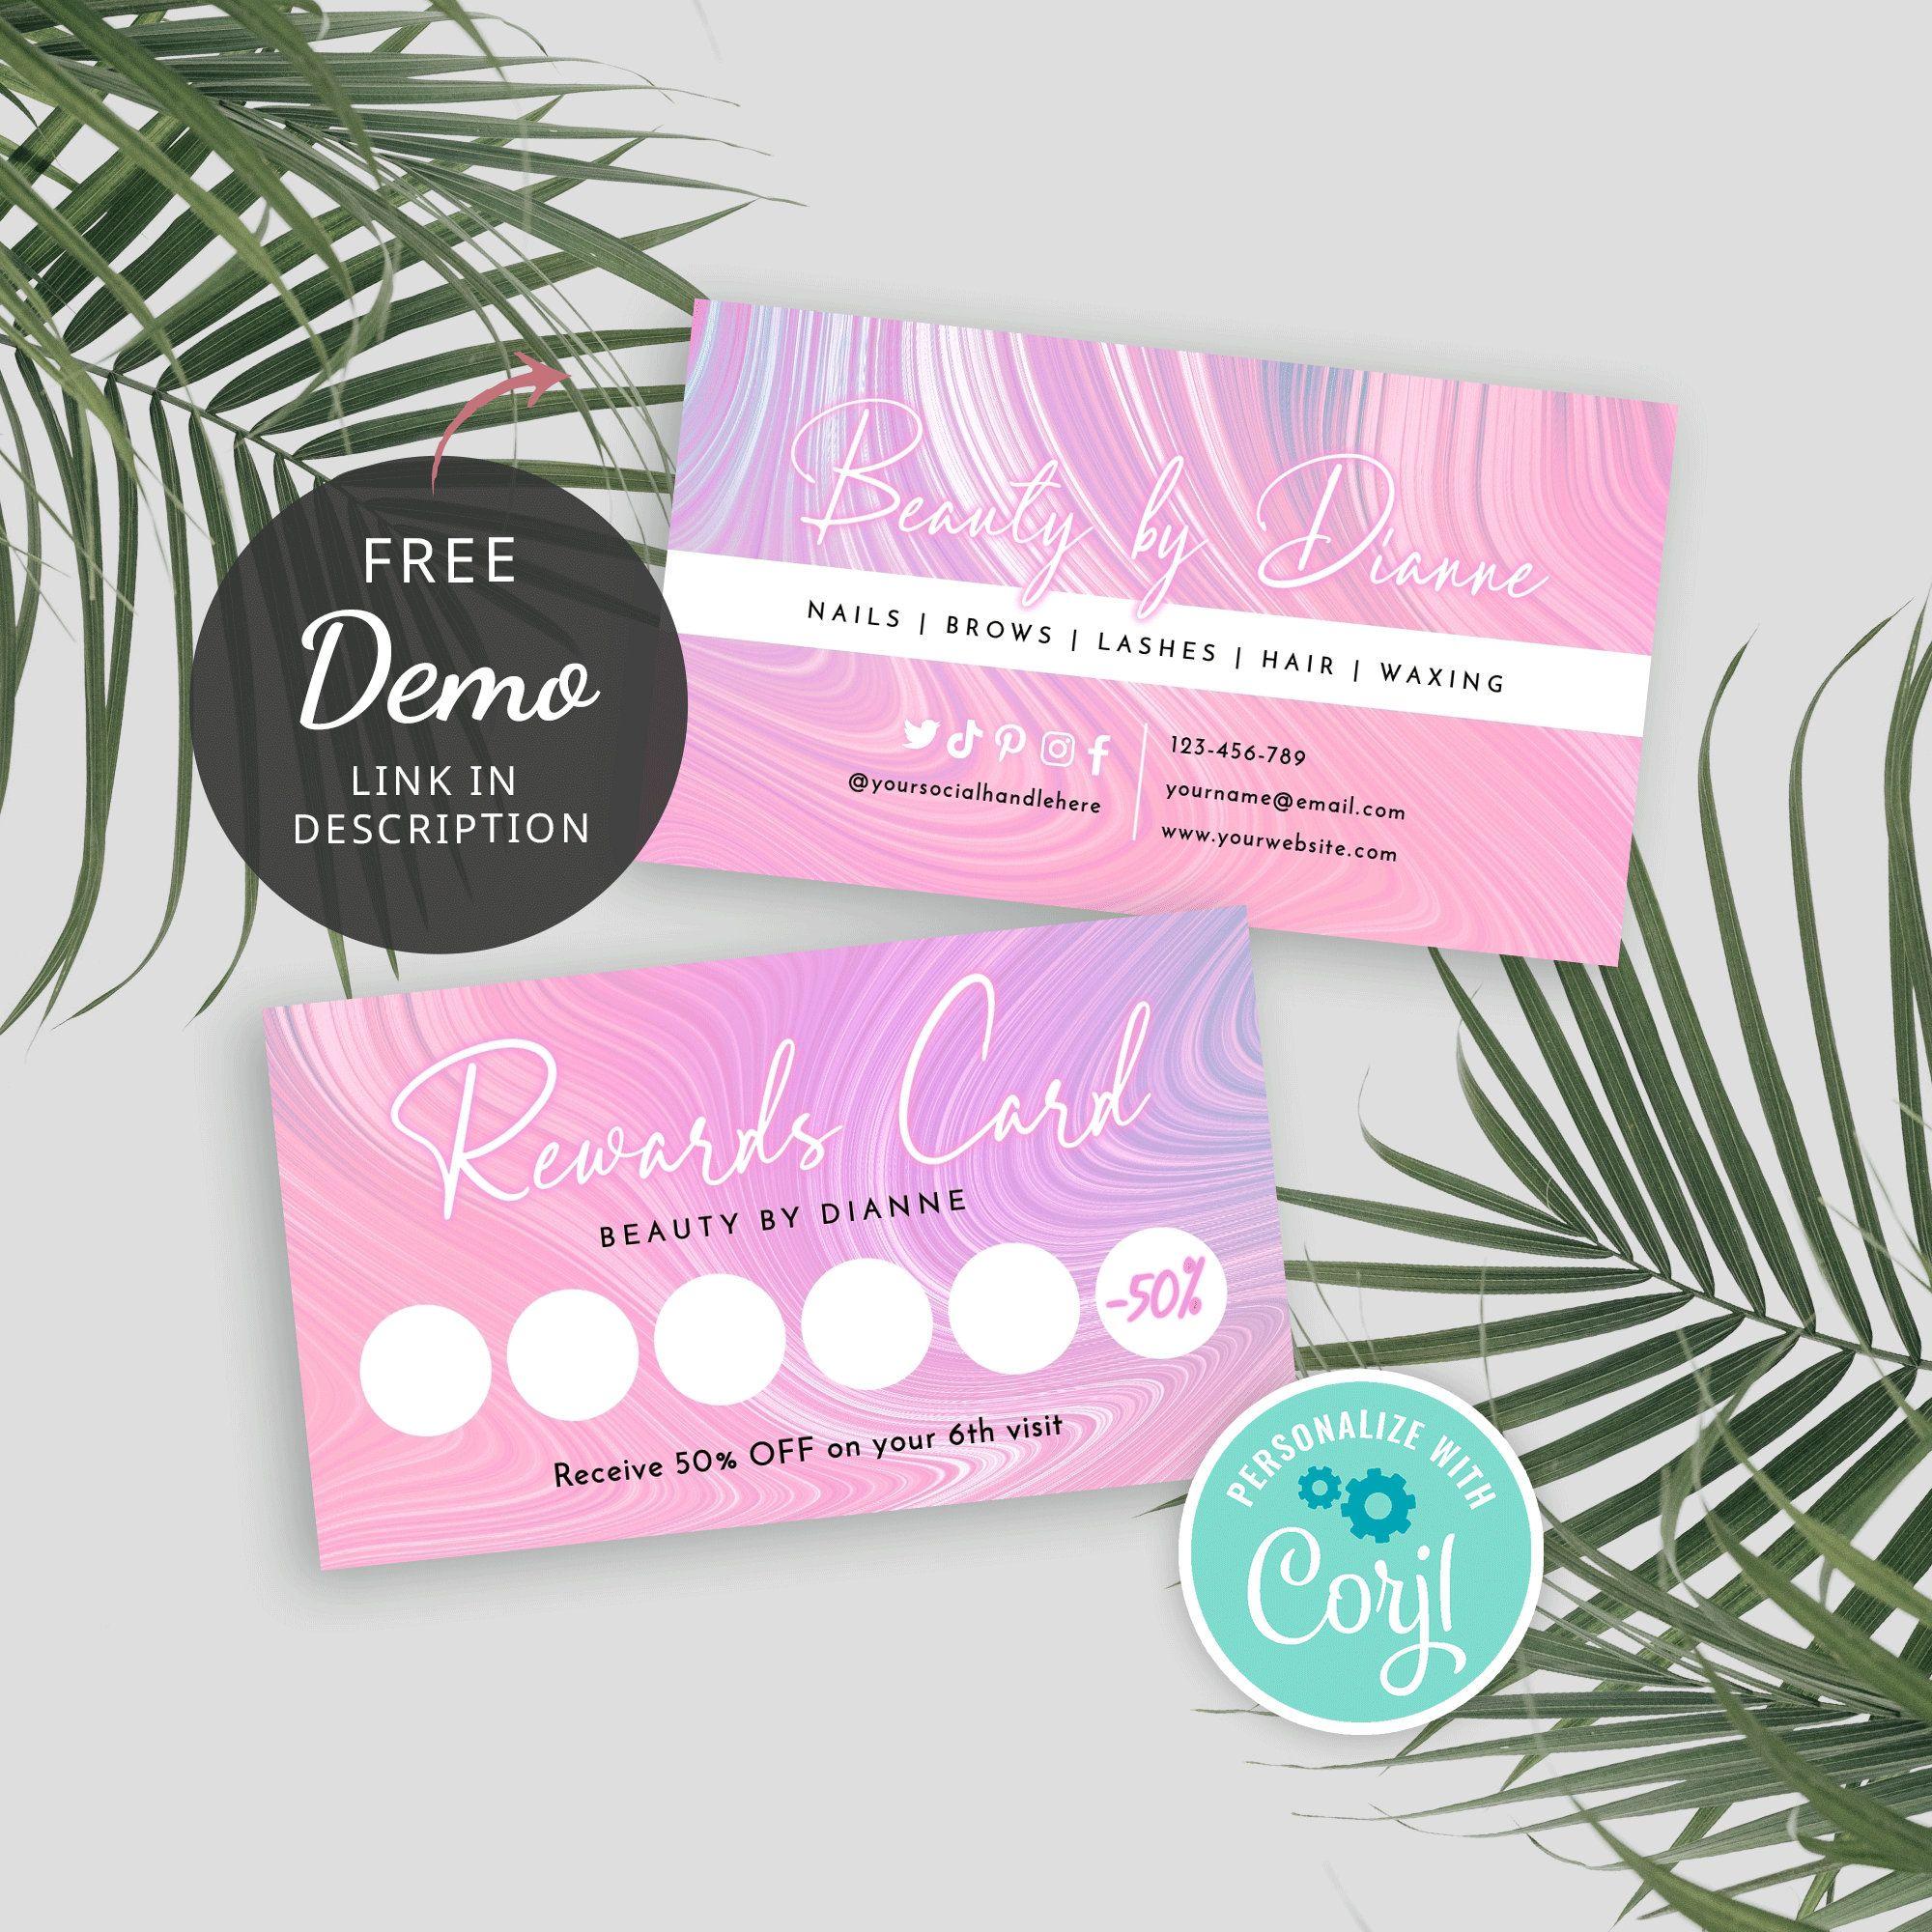 Diy Rewards Card Printable Beauty Loyalty Cards Template Etsy Loyalty Card Template Card Template Stamped Cards